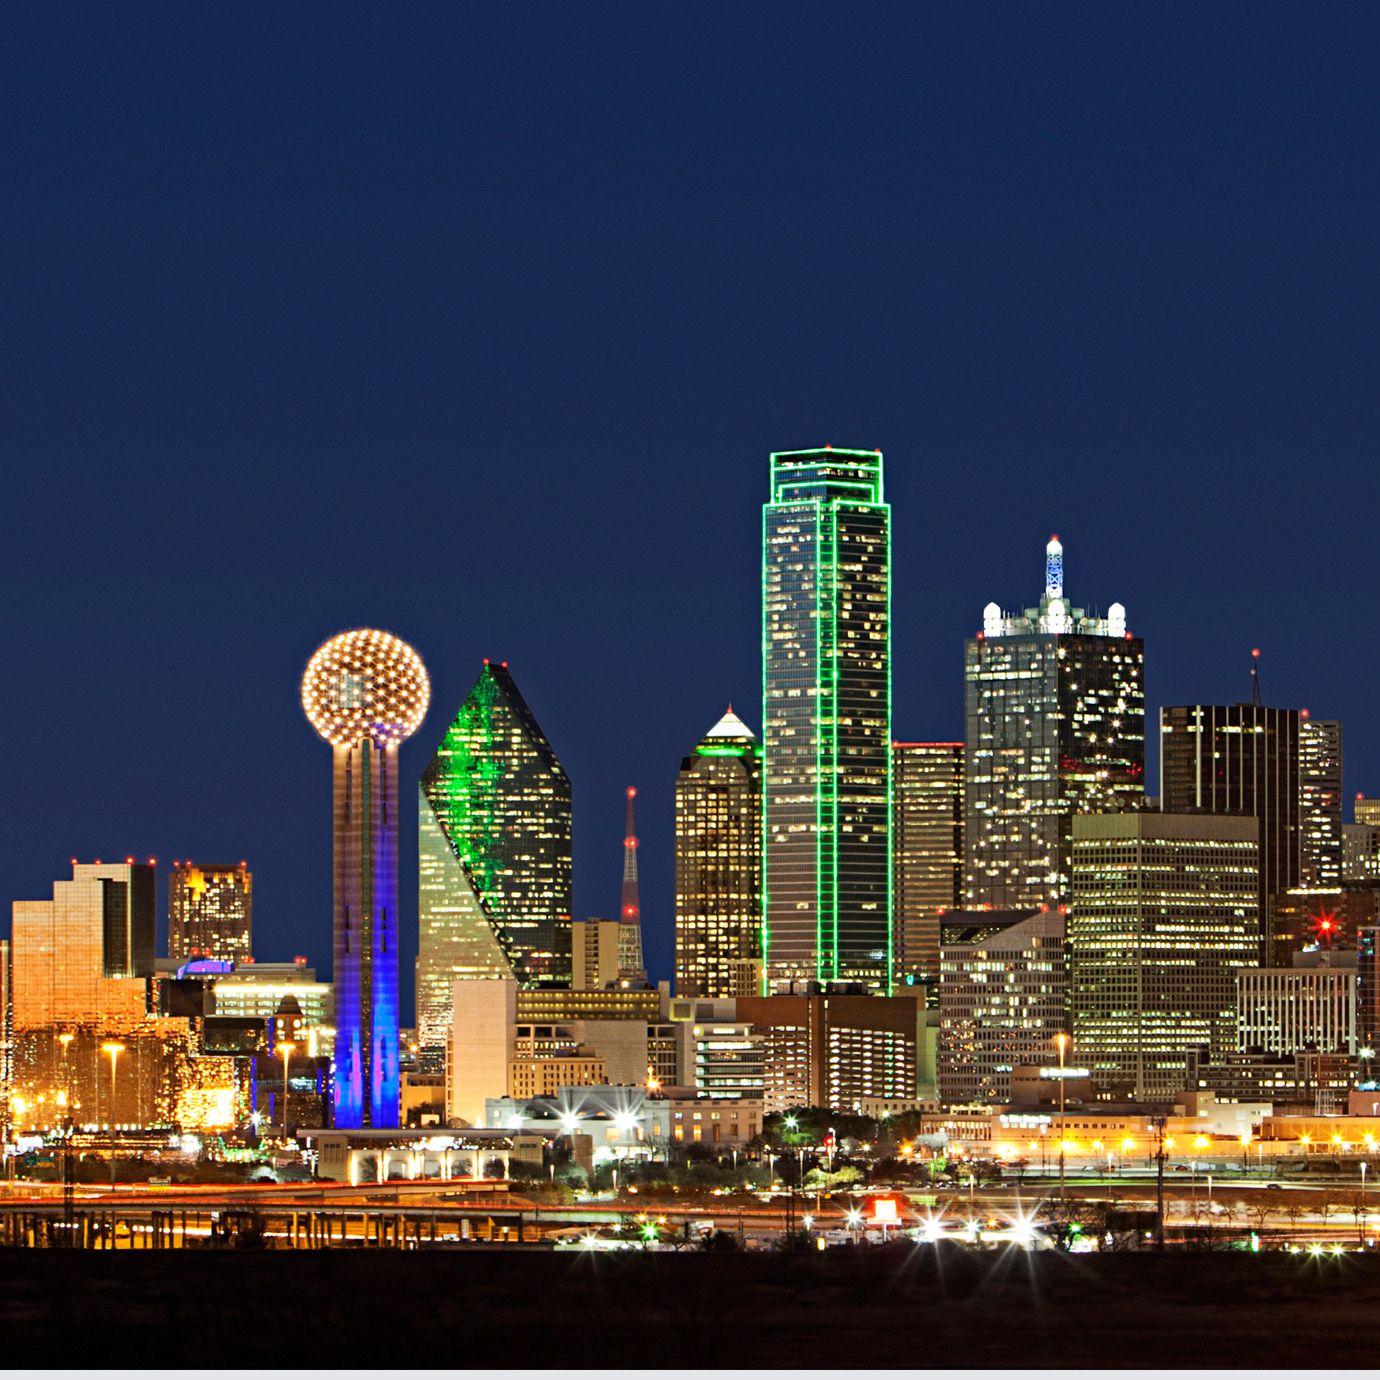 Dallas Skyline Wallpaper   Leaders in Global Real Estate   Dallas   Pinterest   Dallas city ...